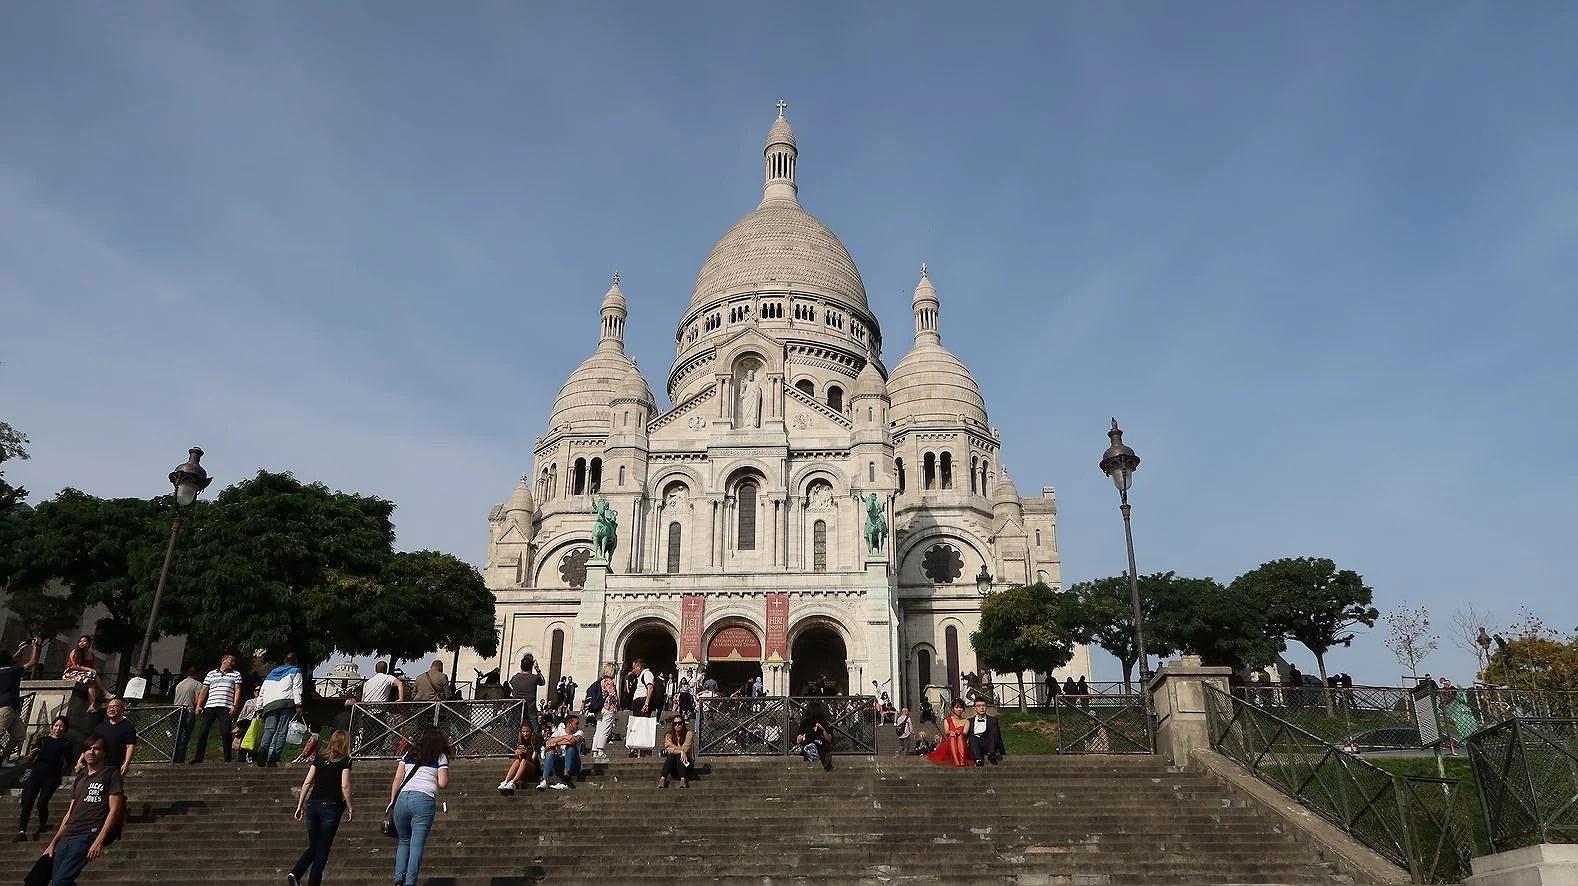 17/10-2017, 18/10-2017 - 3. & 4. dag i Paris